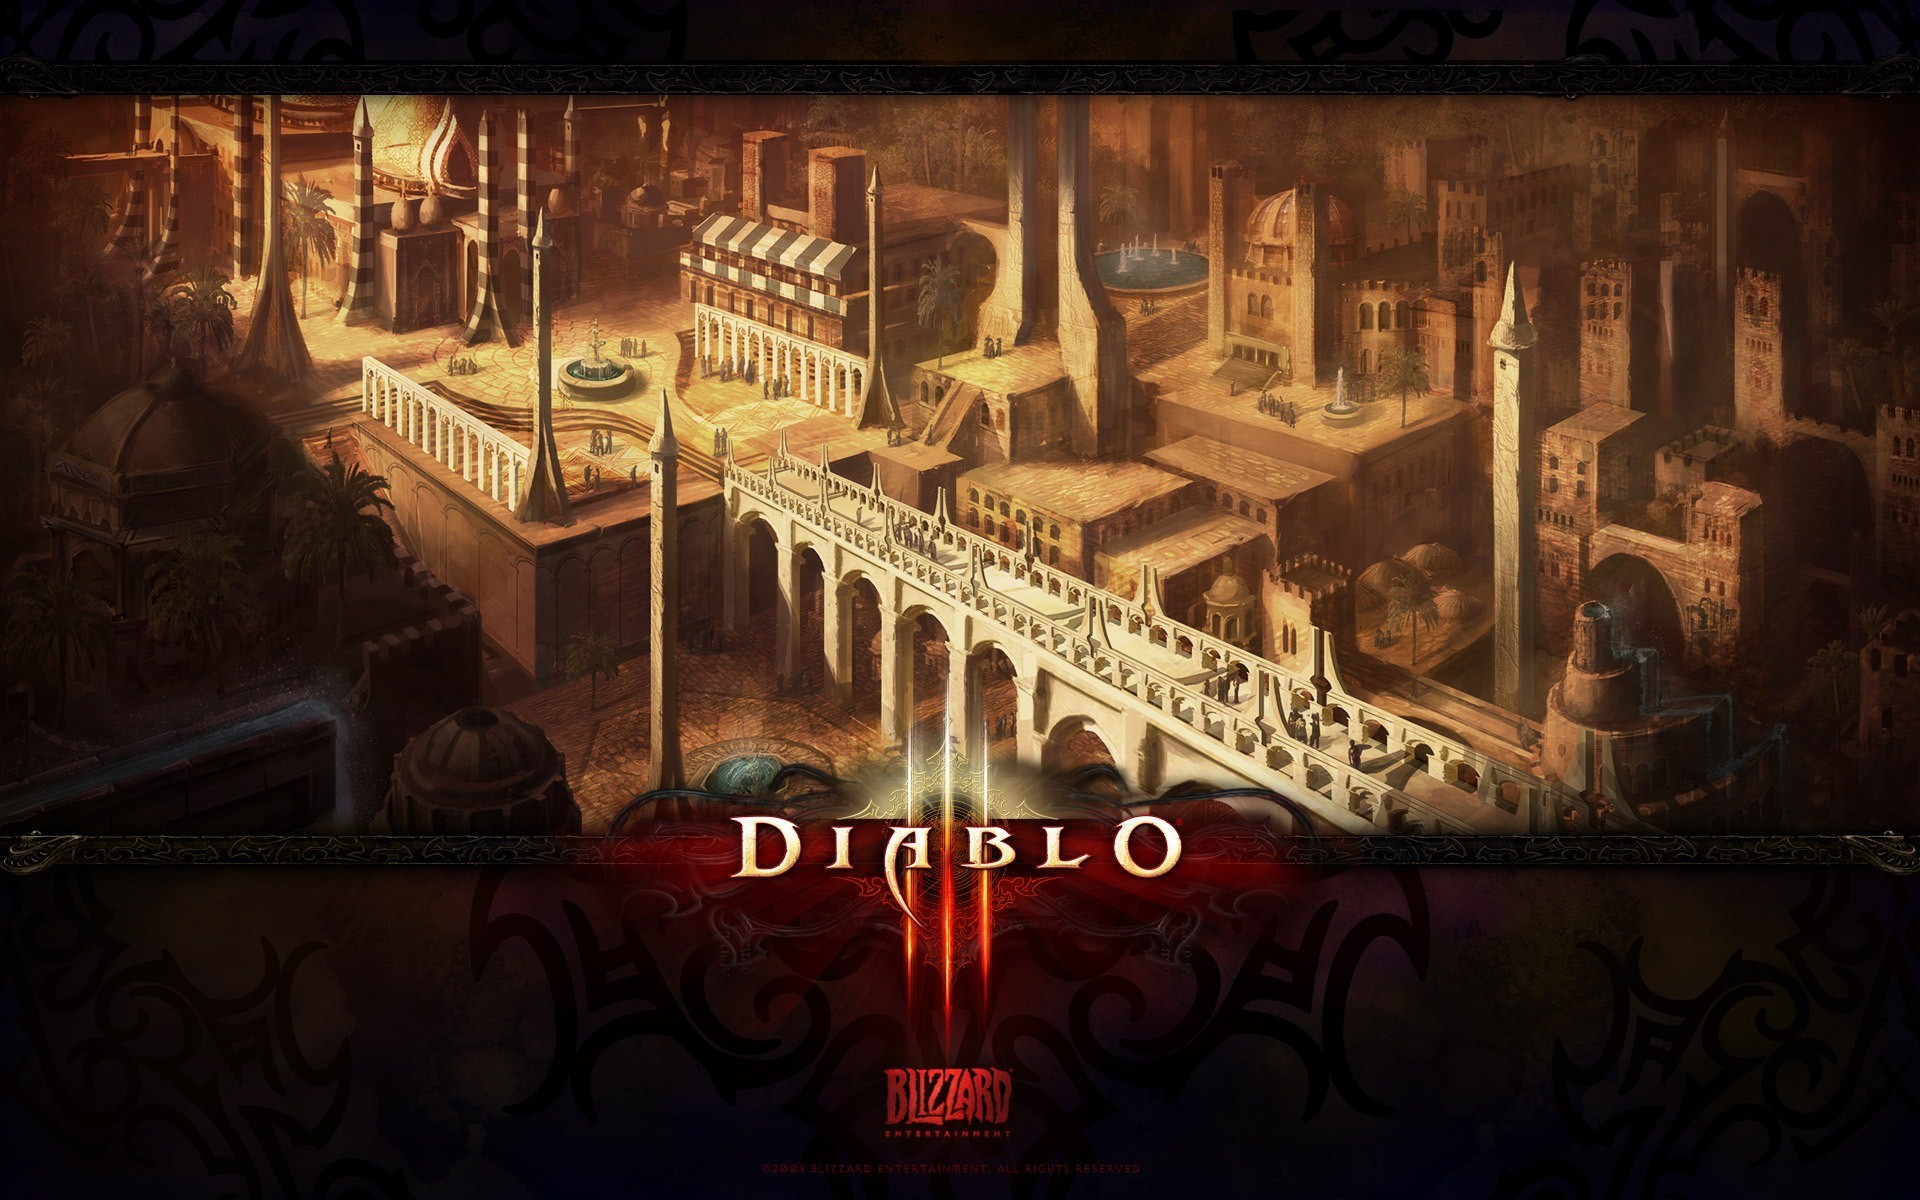 Res: 1920x1200, Image: Diablo 3 Concept Art wallpapers and stock photos. Â«